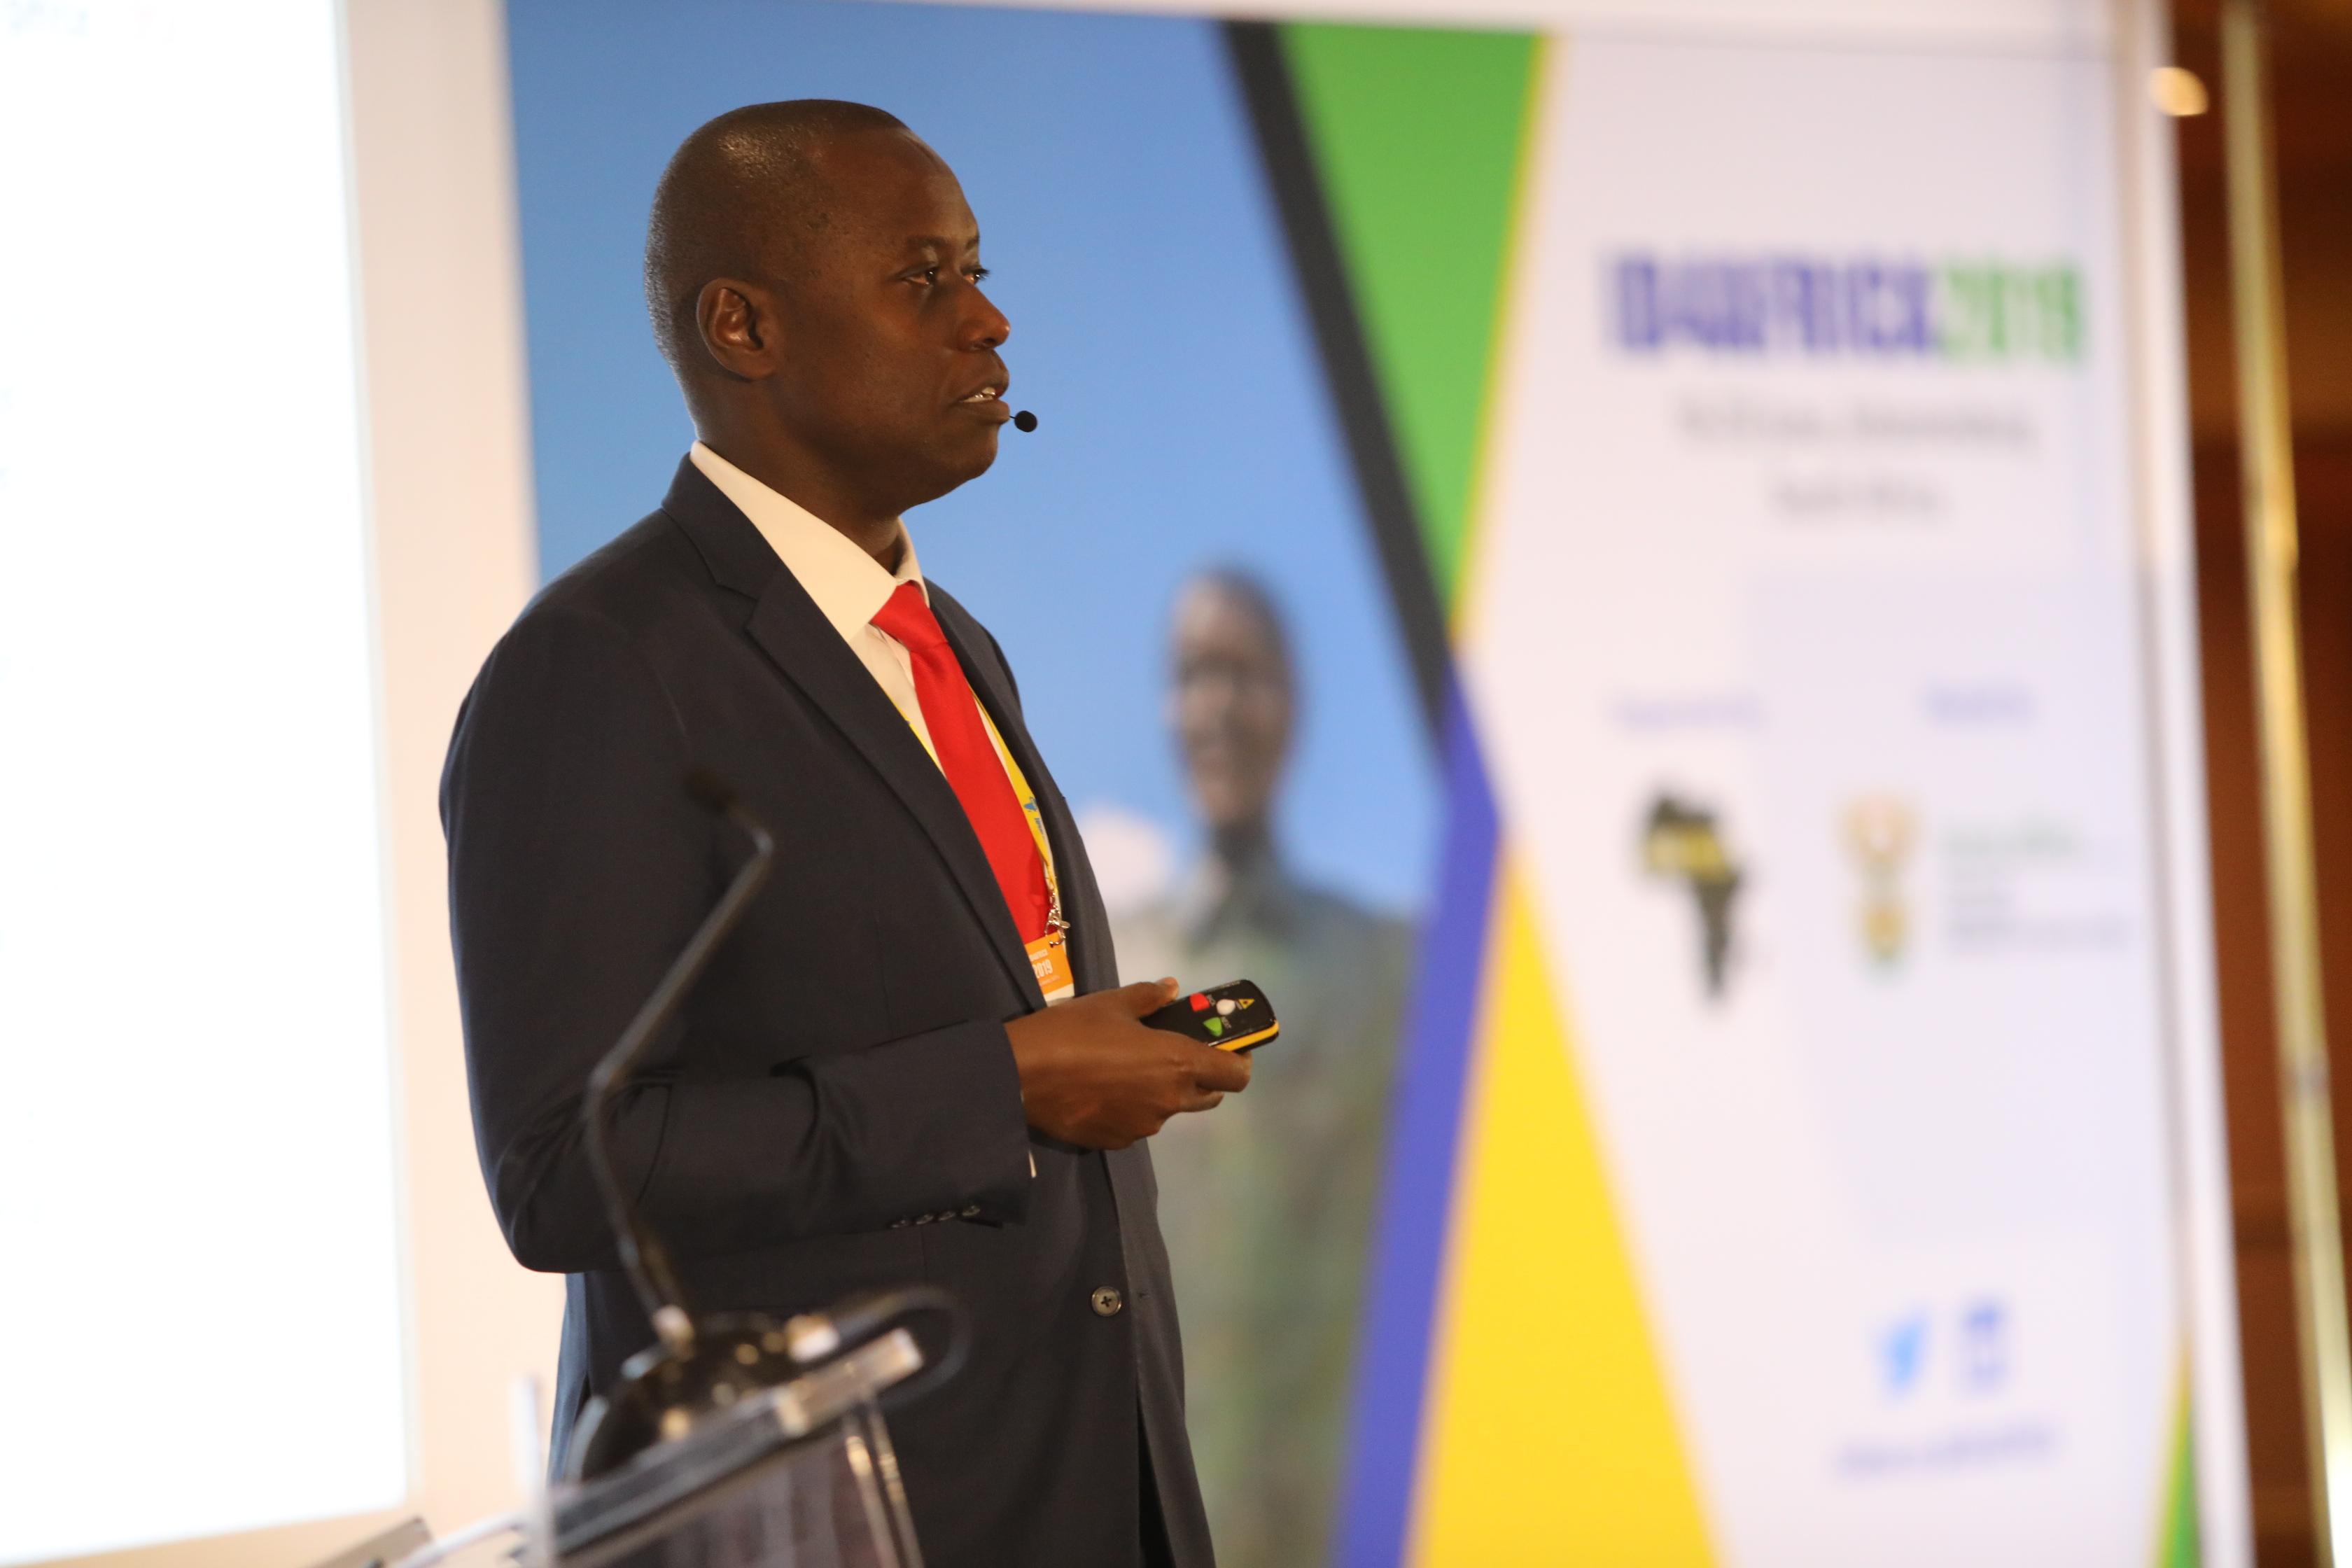 Kenya Robert MUGO